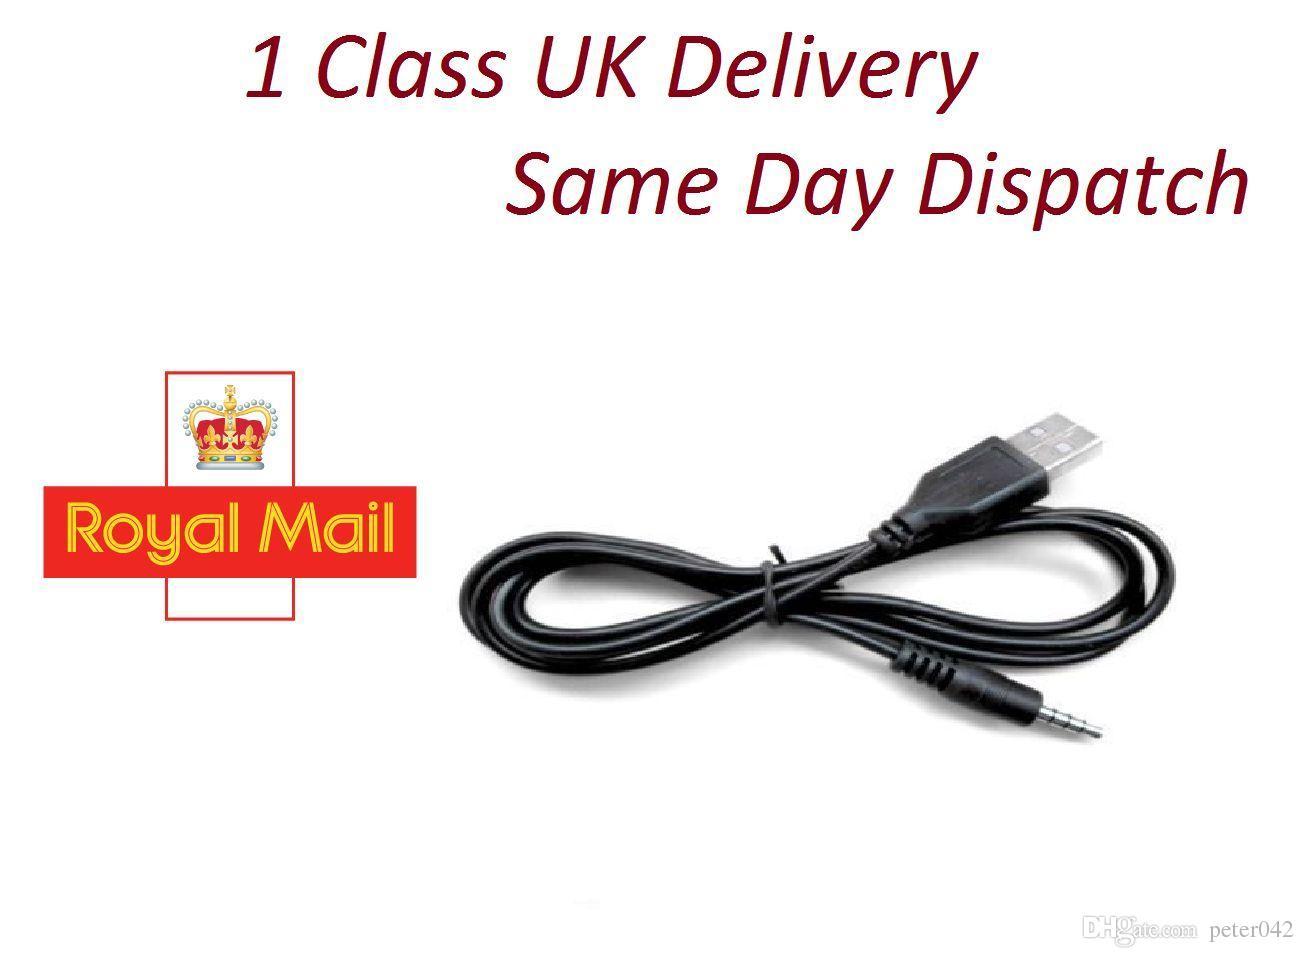 USB-кабель Aux 3,5 мм мужчин и аудио Тип A штекер разъем для наушников разъем A2